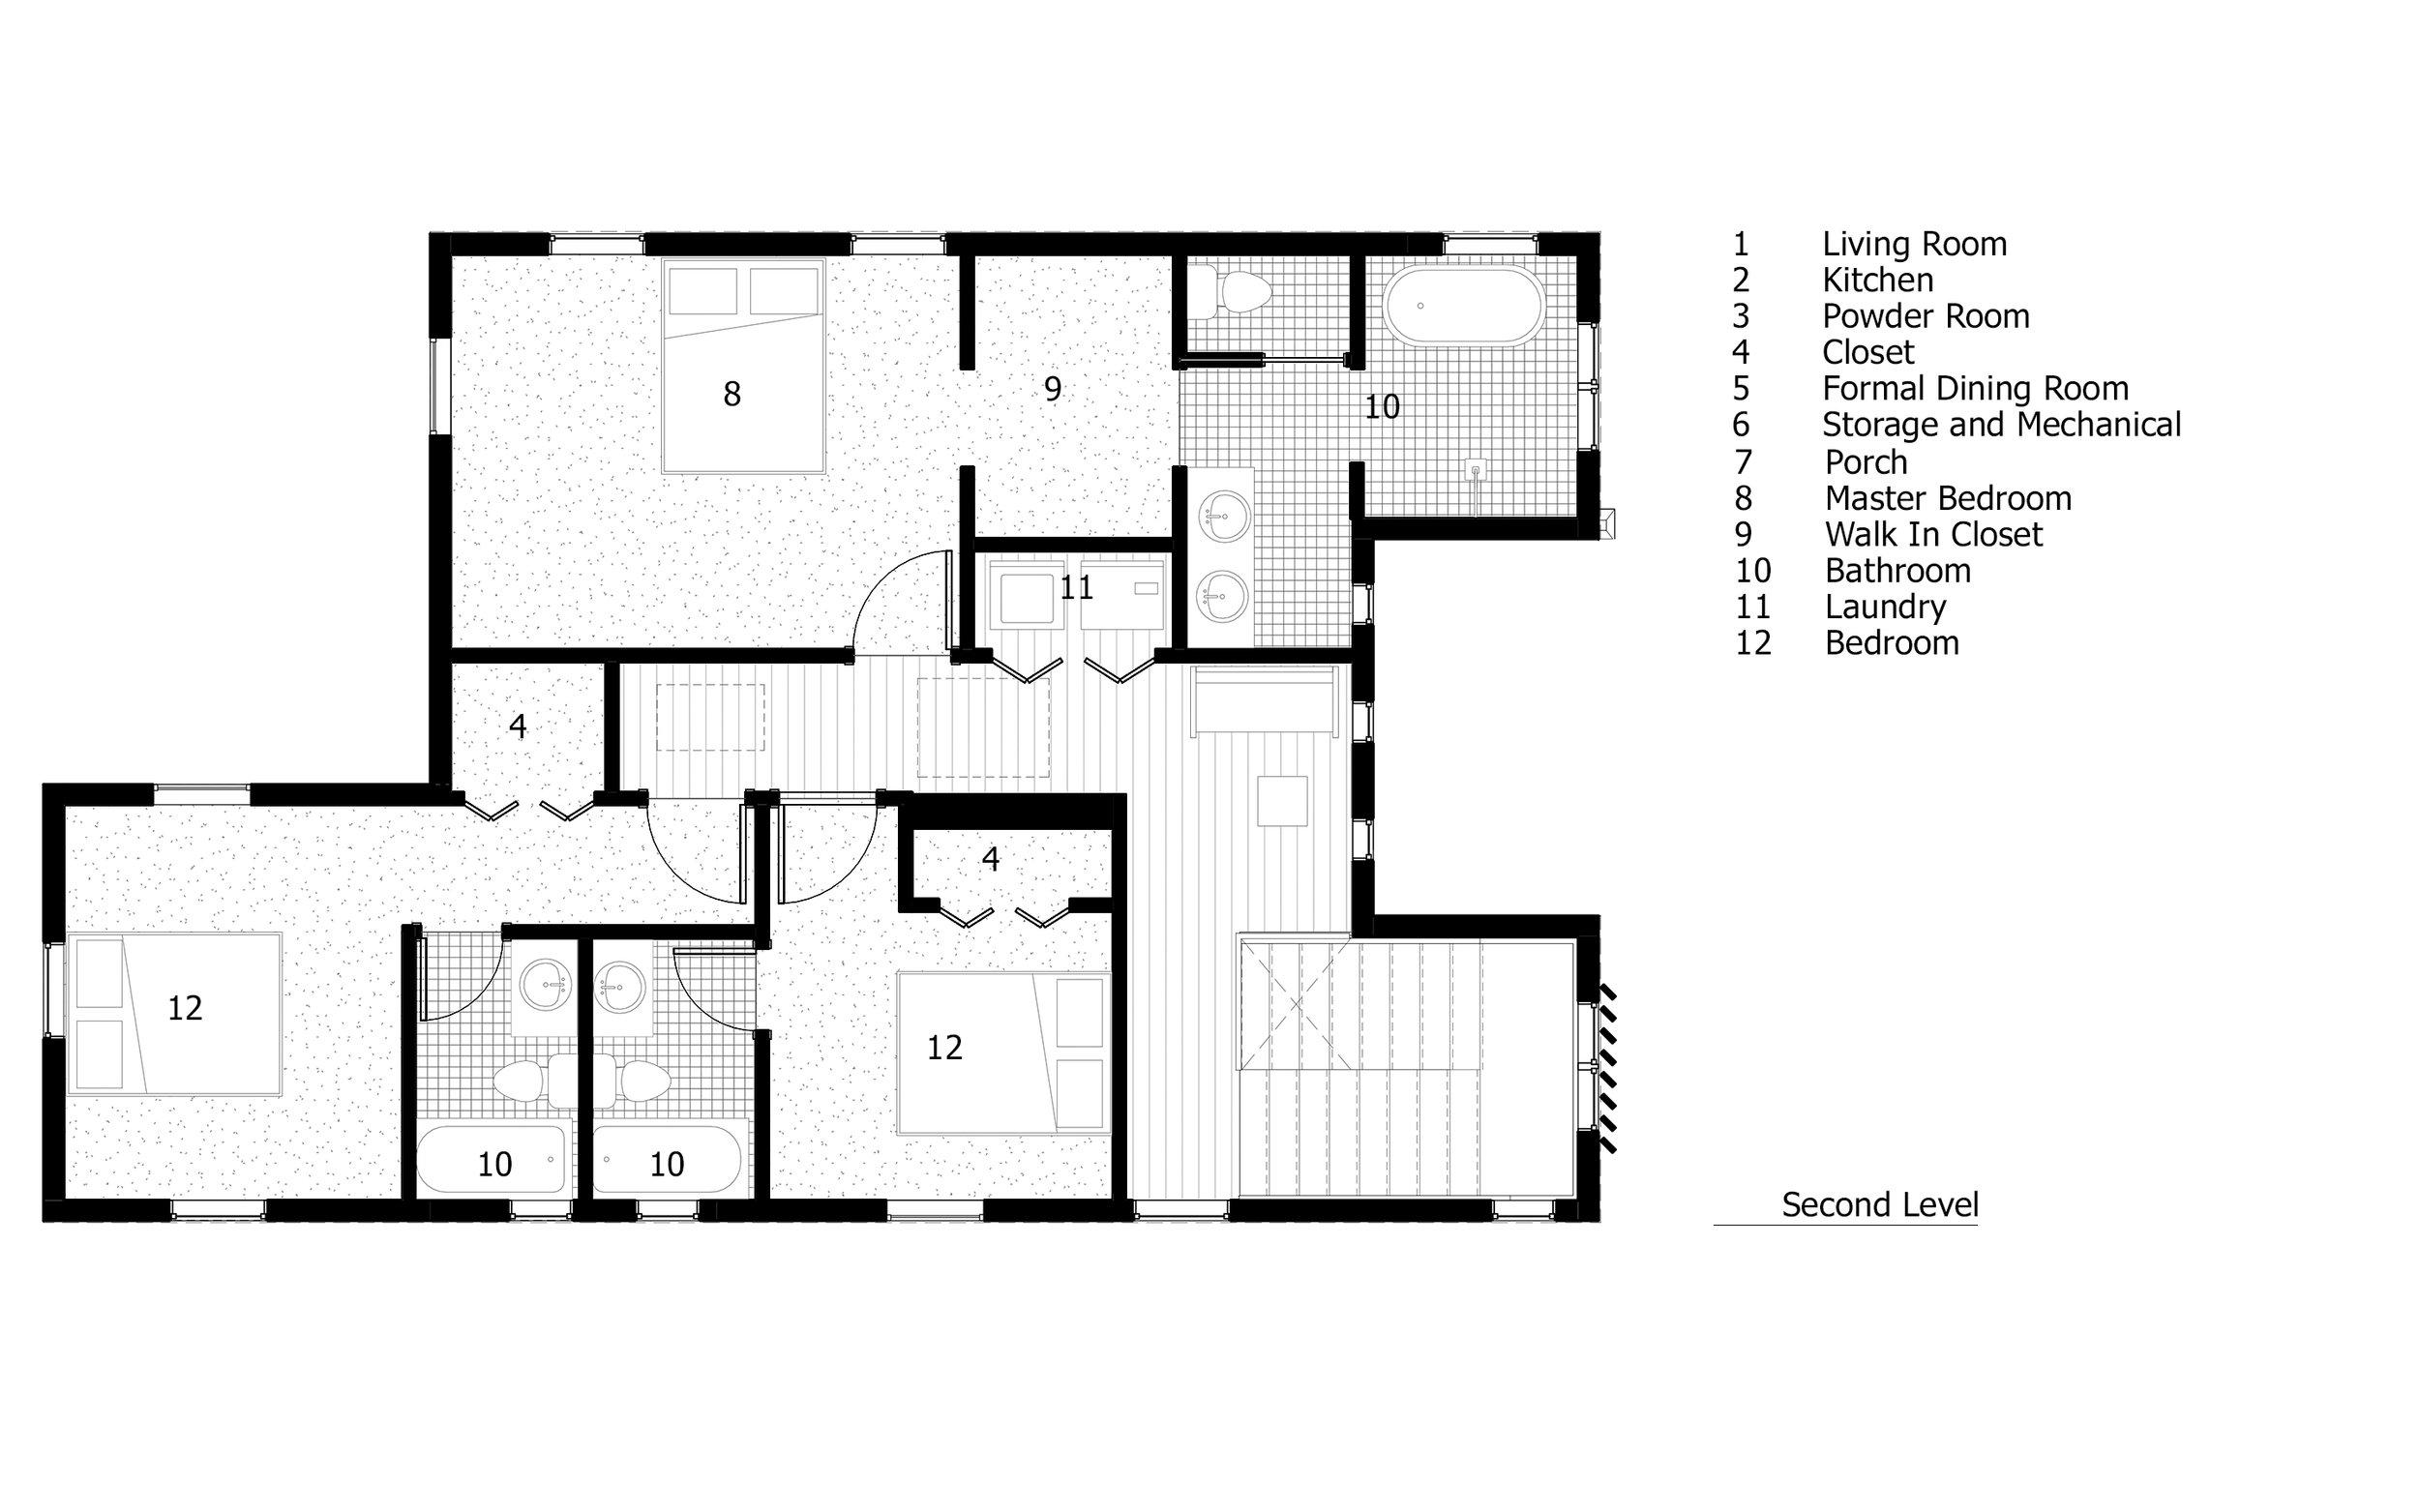 Vallejo FINAL Second Level Plans 20181213.jpg